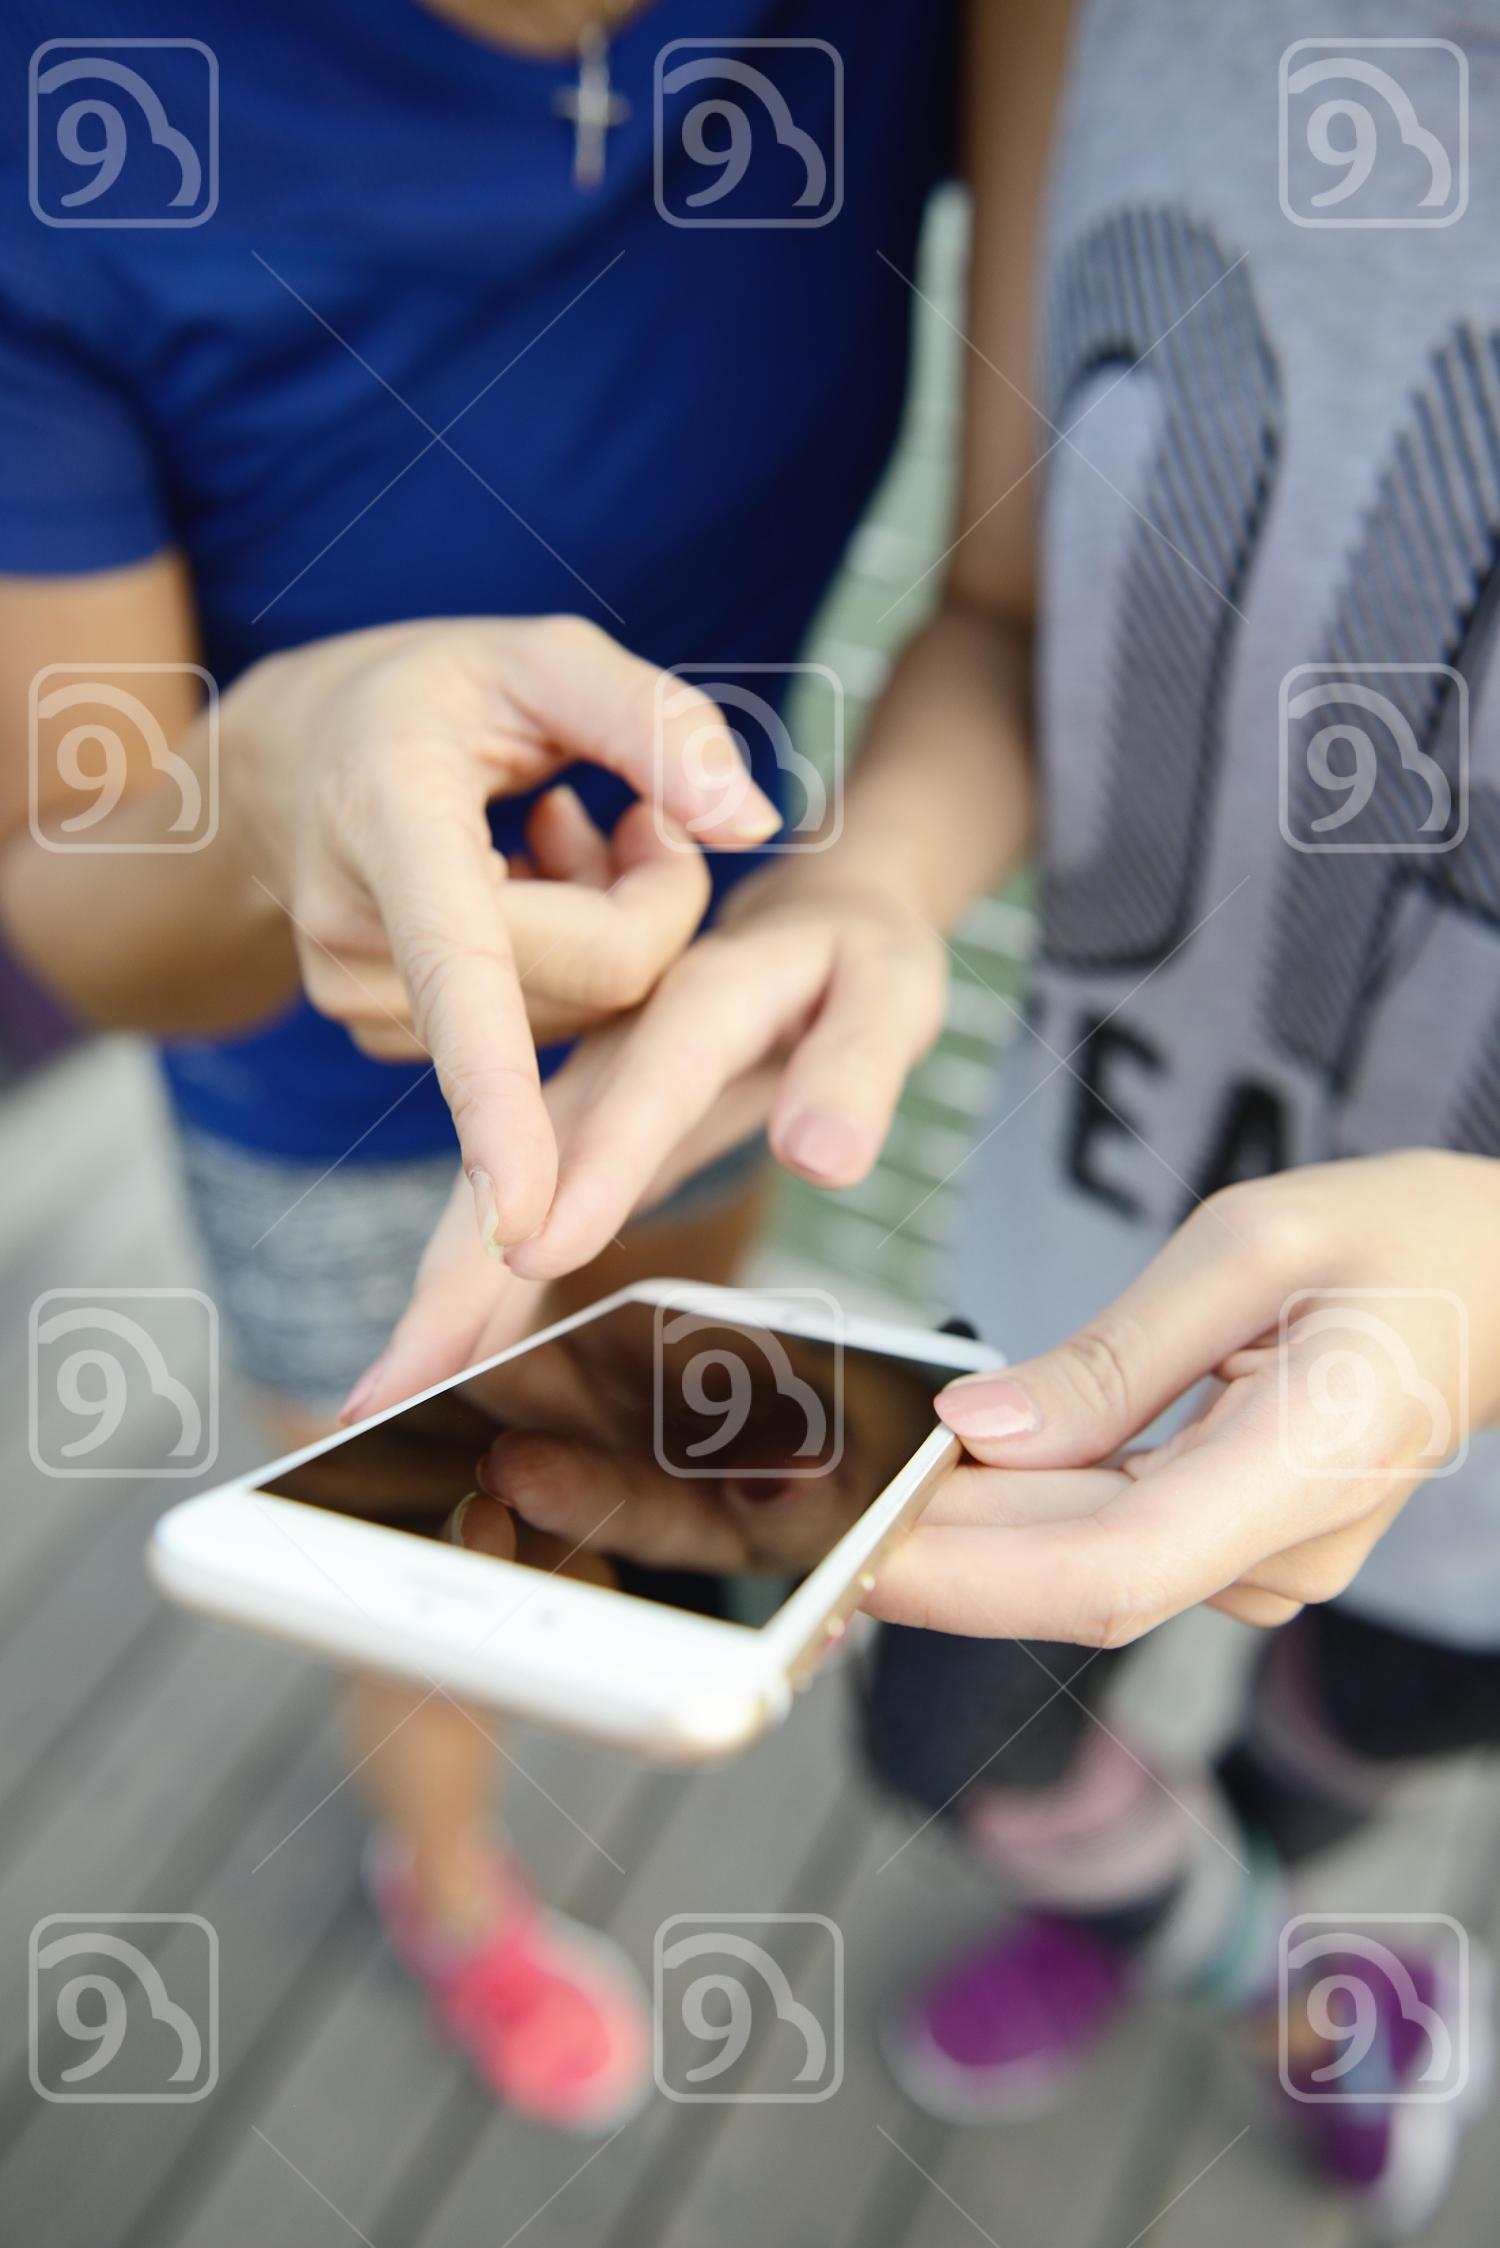 Women bonding over a videoclip